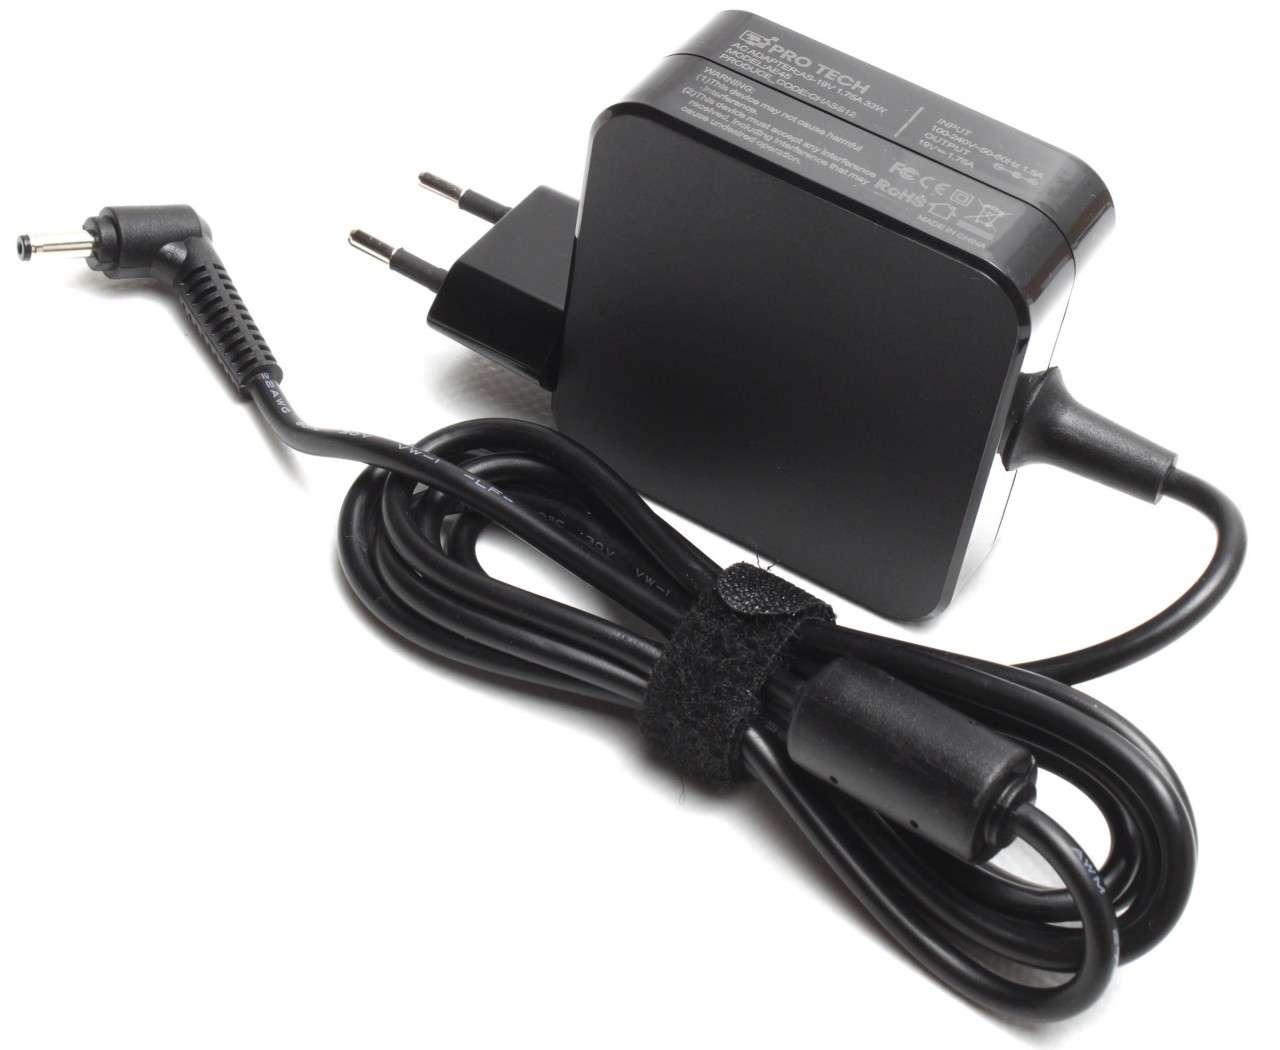 Incarcator Asus VivoBook F200LA Replacement imagine powerlaptop.ro 2021